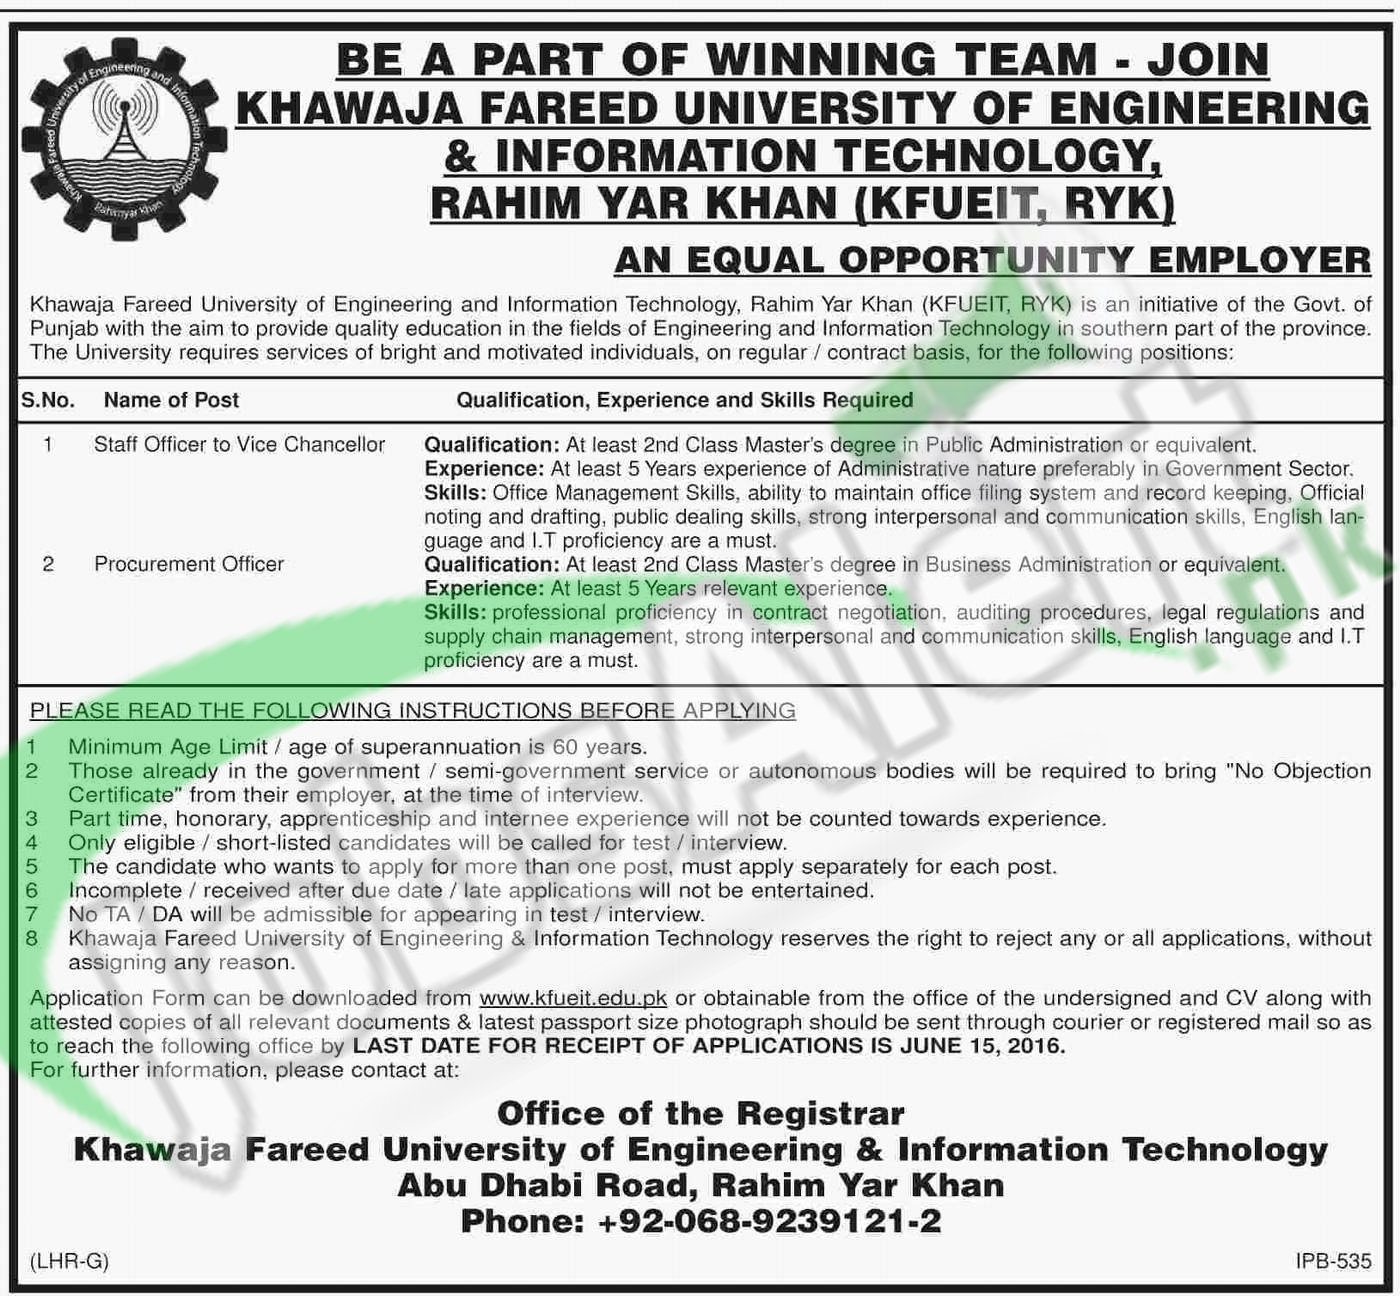 Khawaja Fareed University of Engineering & IT